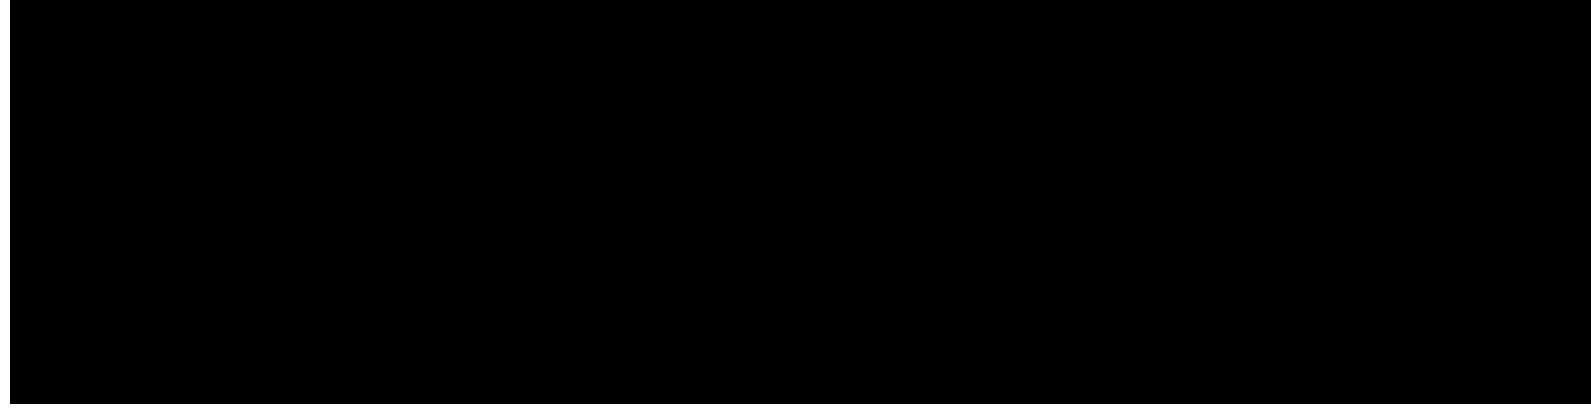 Client Logo Black - LJ Morelli